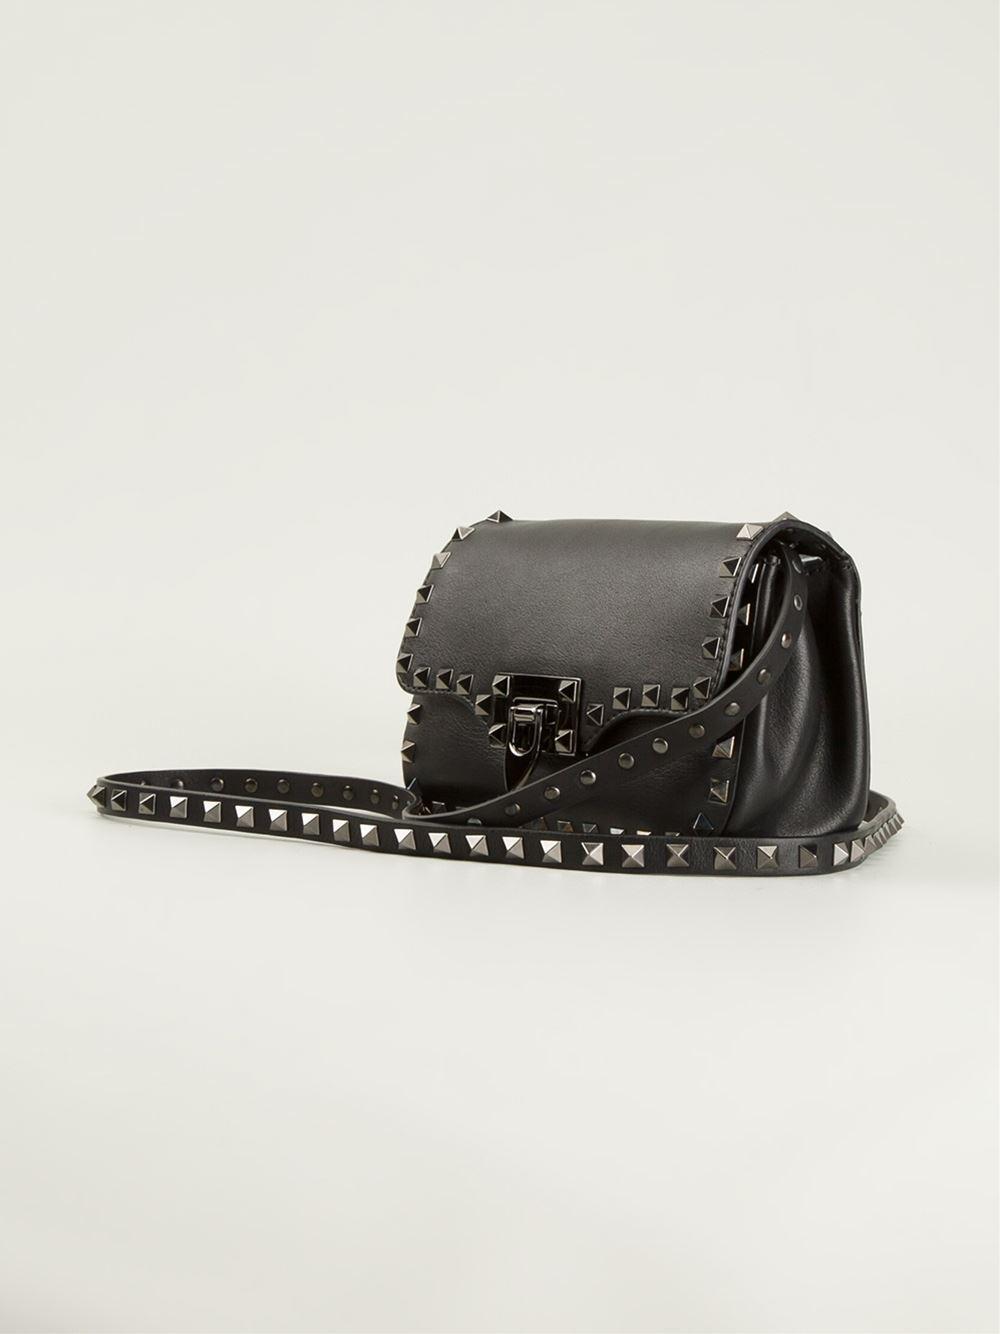 bee4d4ab6b Valentino 'Rockstud Noir' Cross Body Bag in Black - Lyst